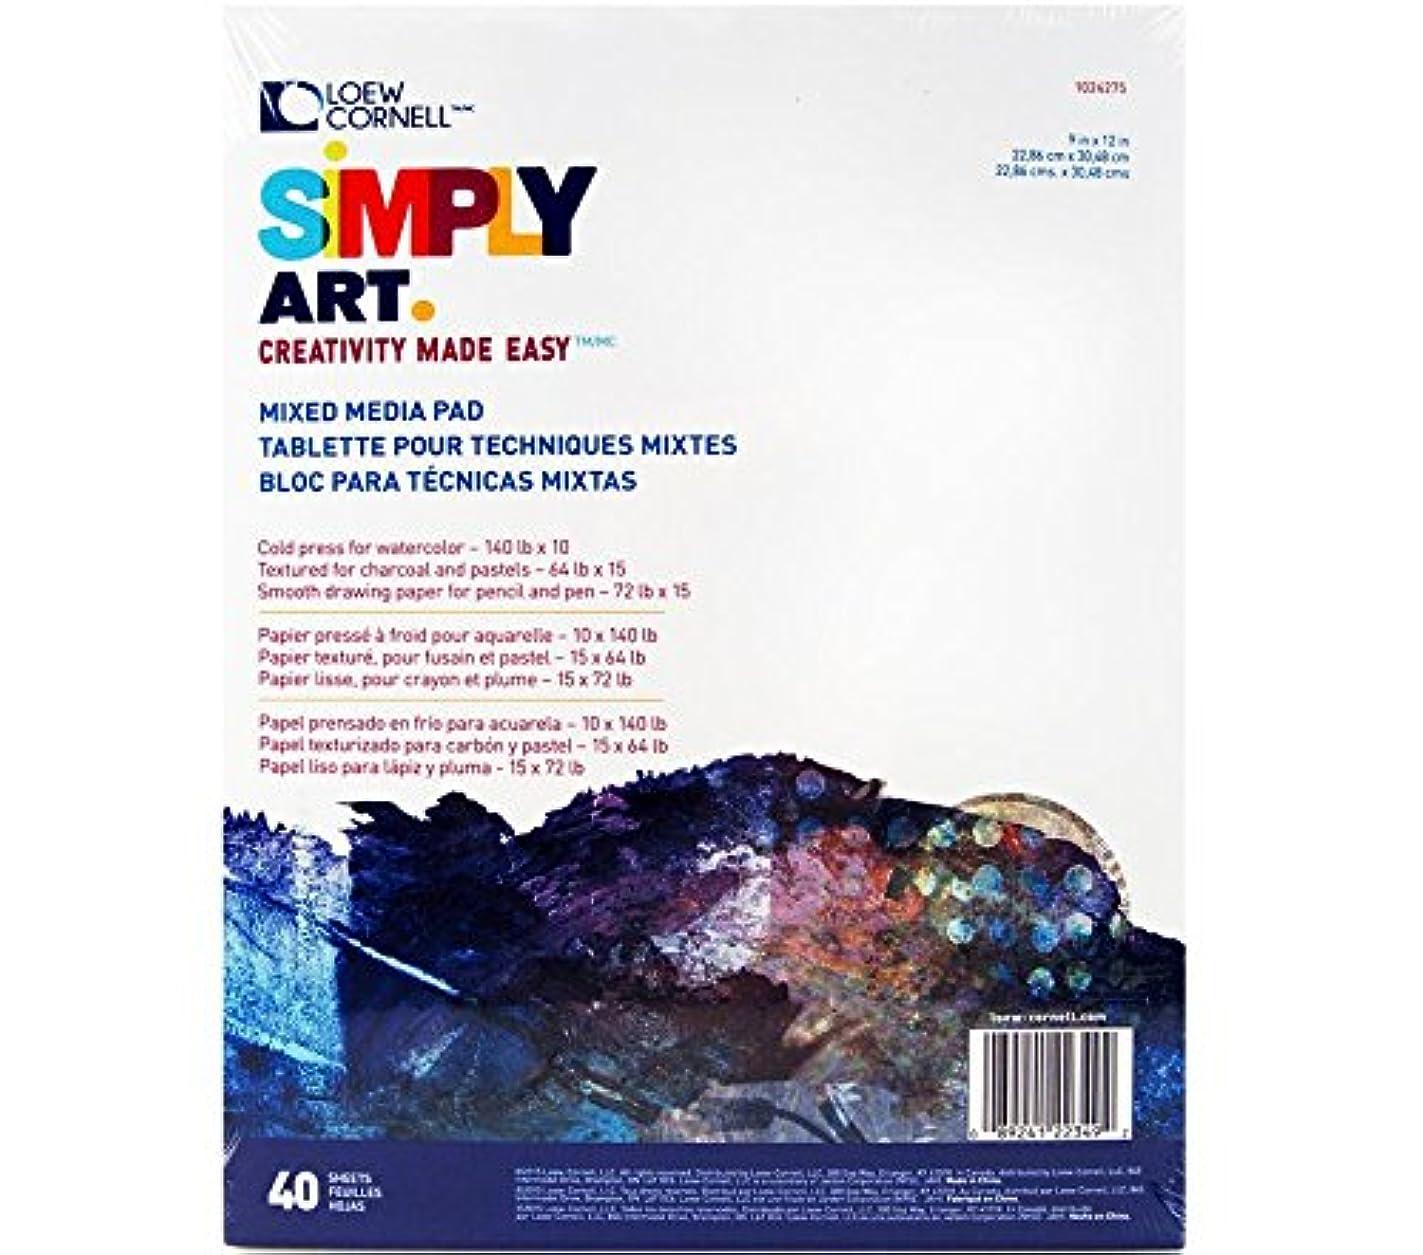 Loew-Cornell Simply Art Mixed Media Paper Pad rsh61849623